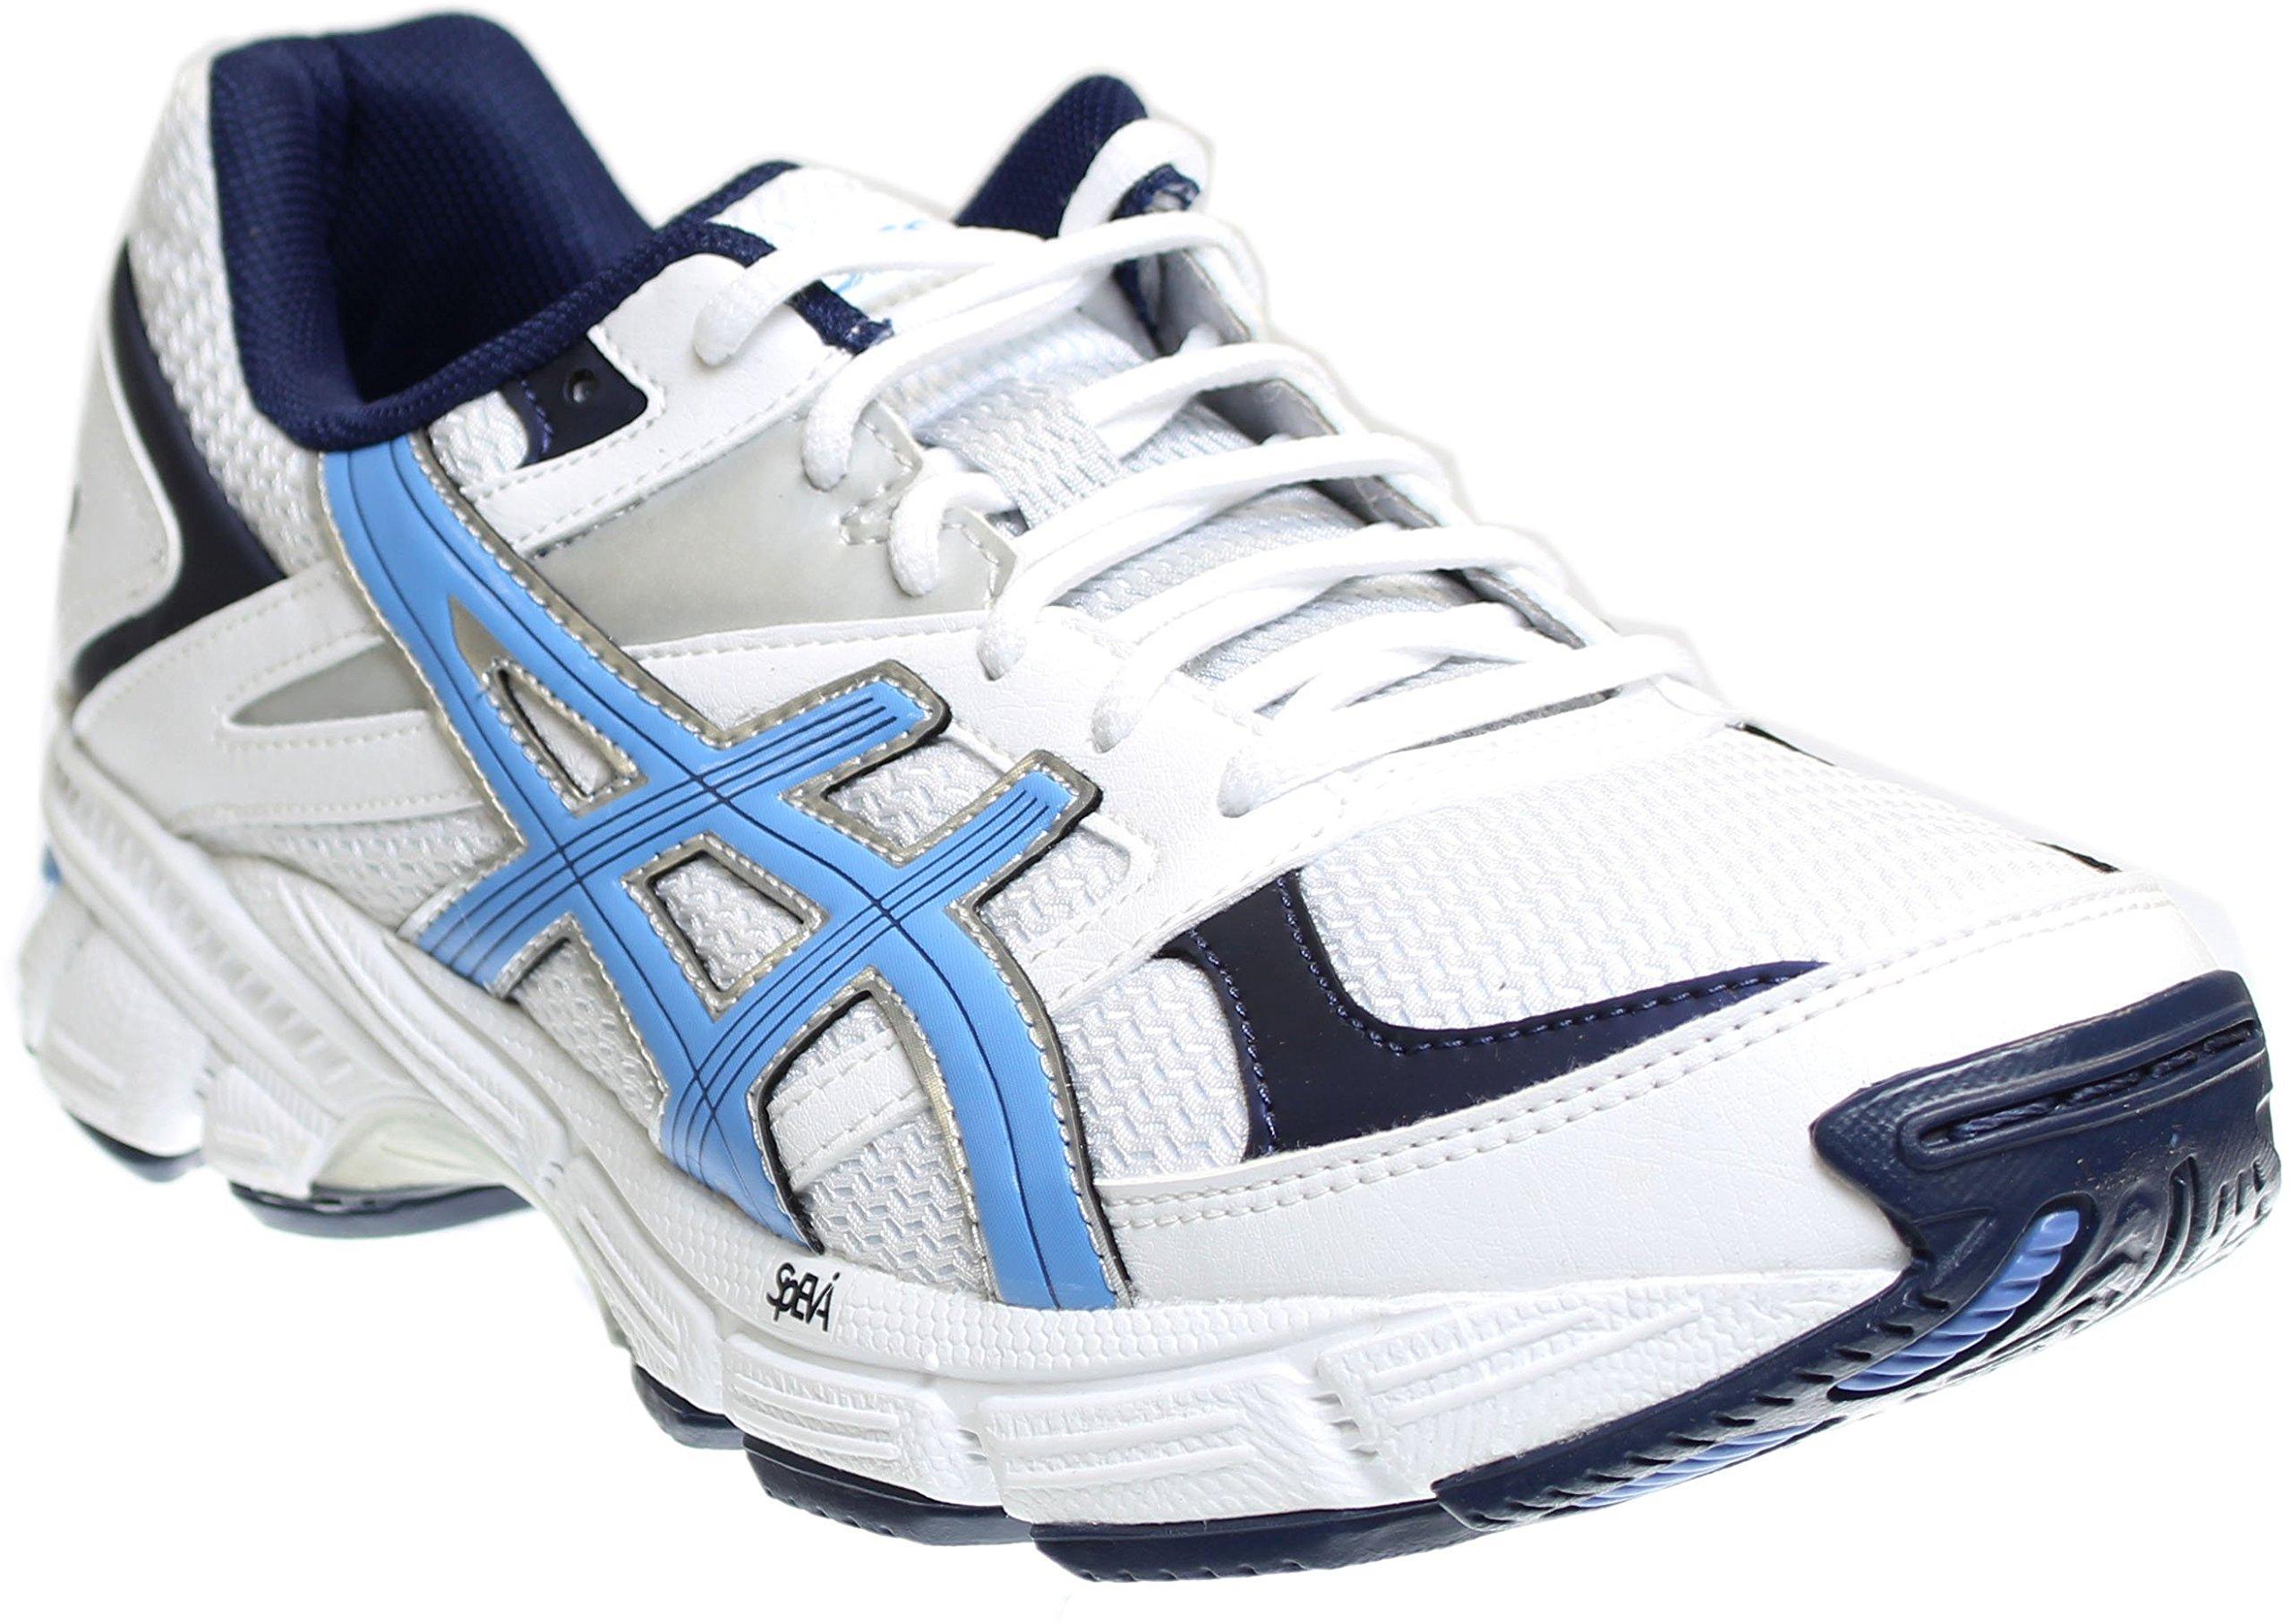 ASICS Women's Gel 190 TR Training Shoe, White/Periwinkle/Midnight Navy, 9.5 2E US